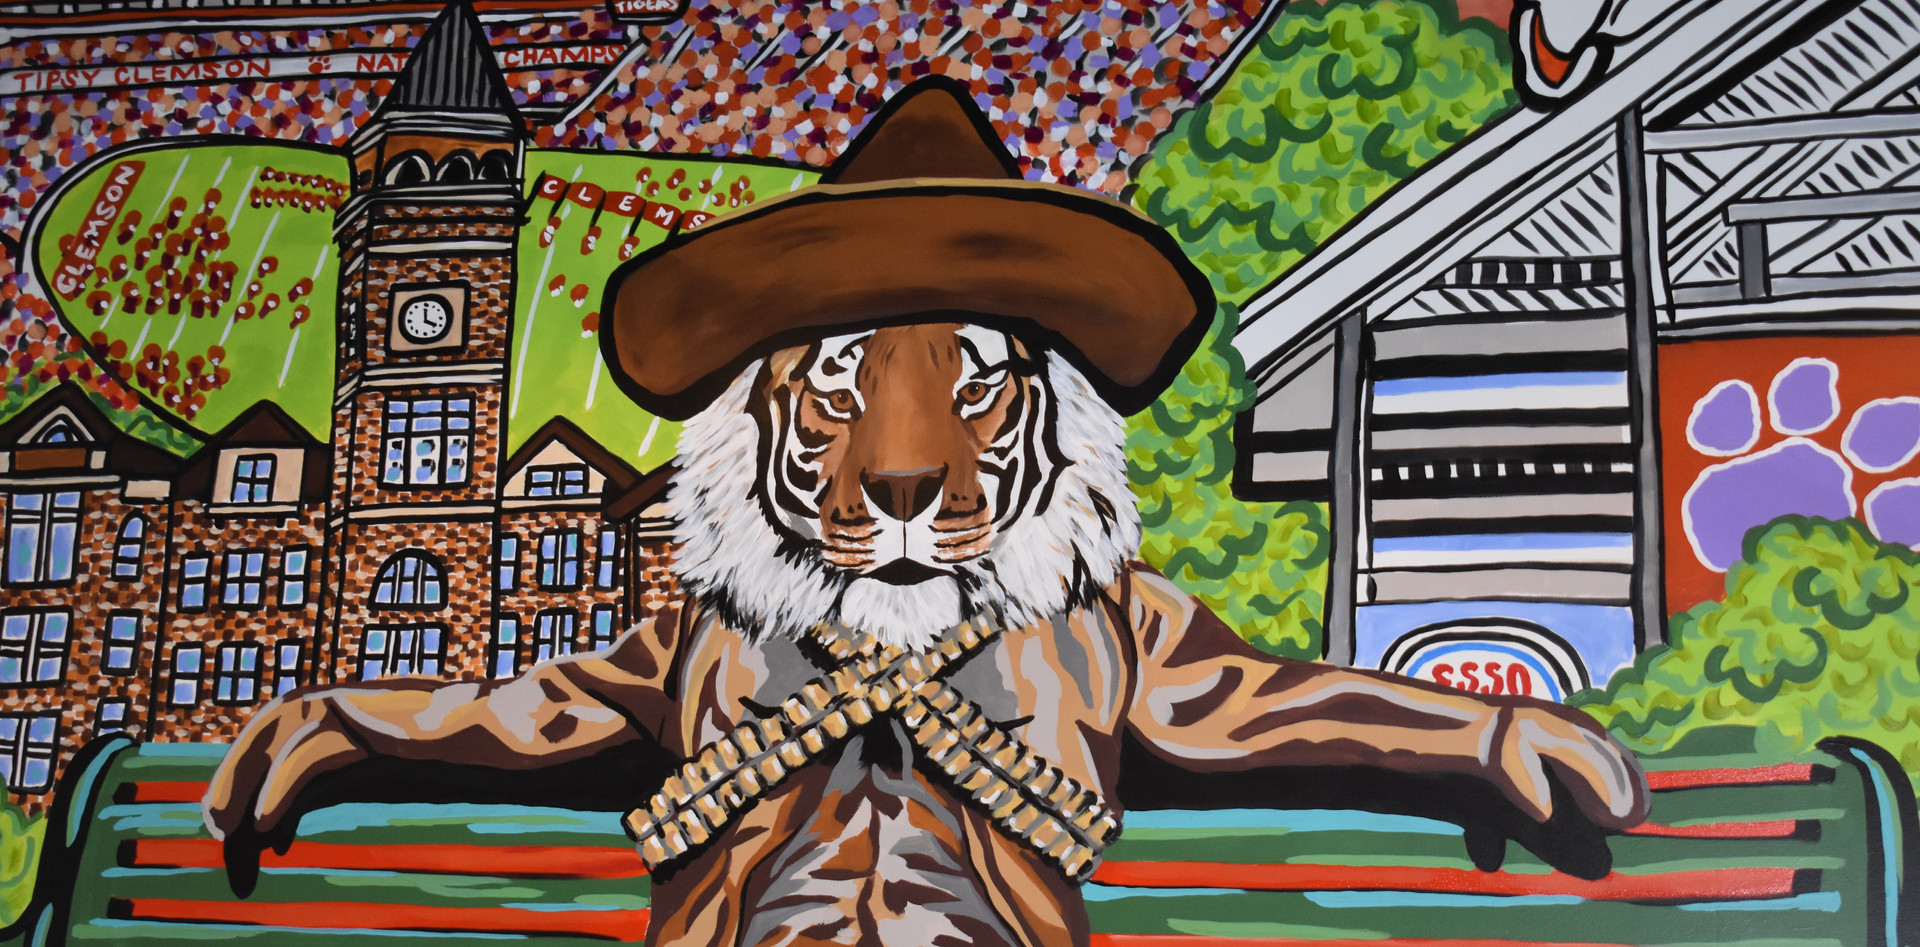 Tiger Mural - Tipsy Taco Clemson